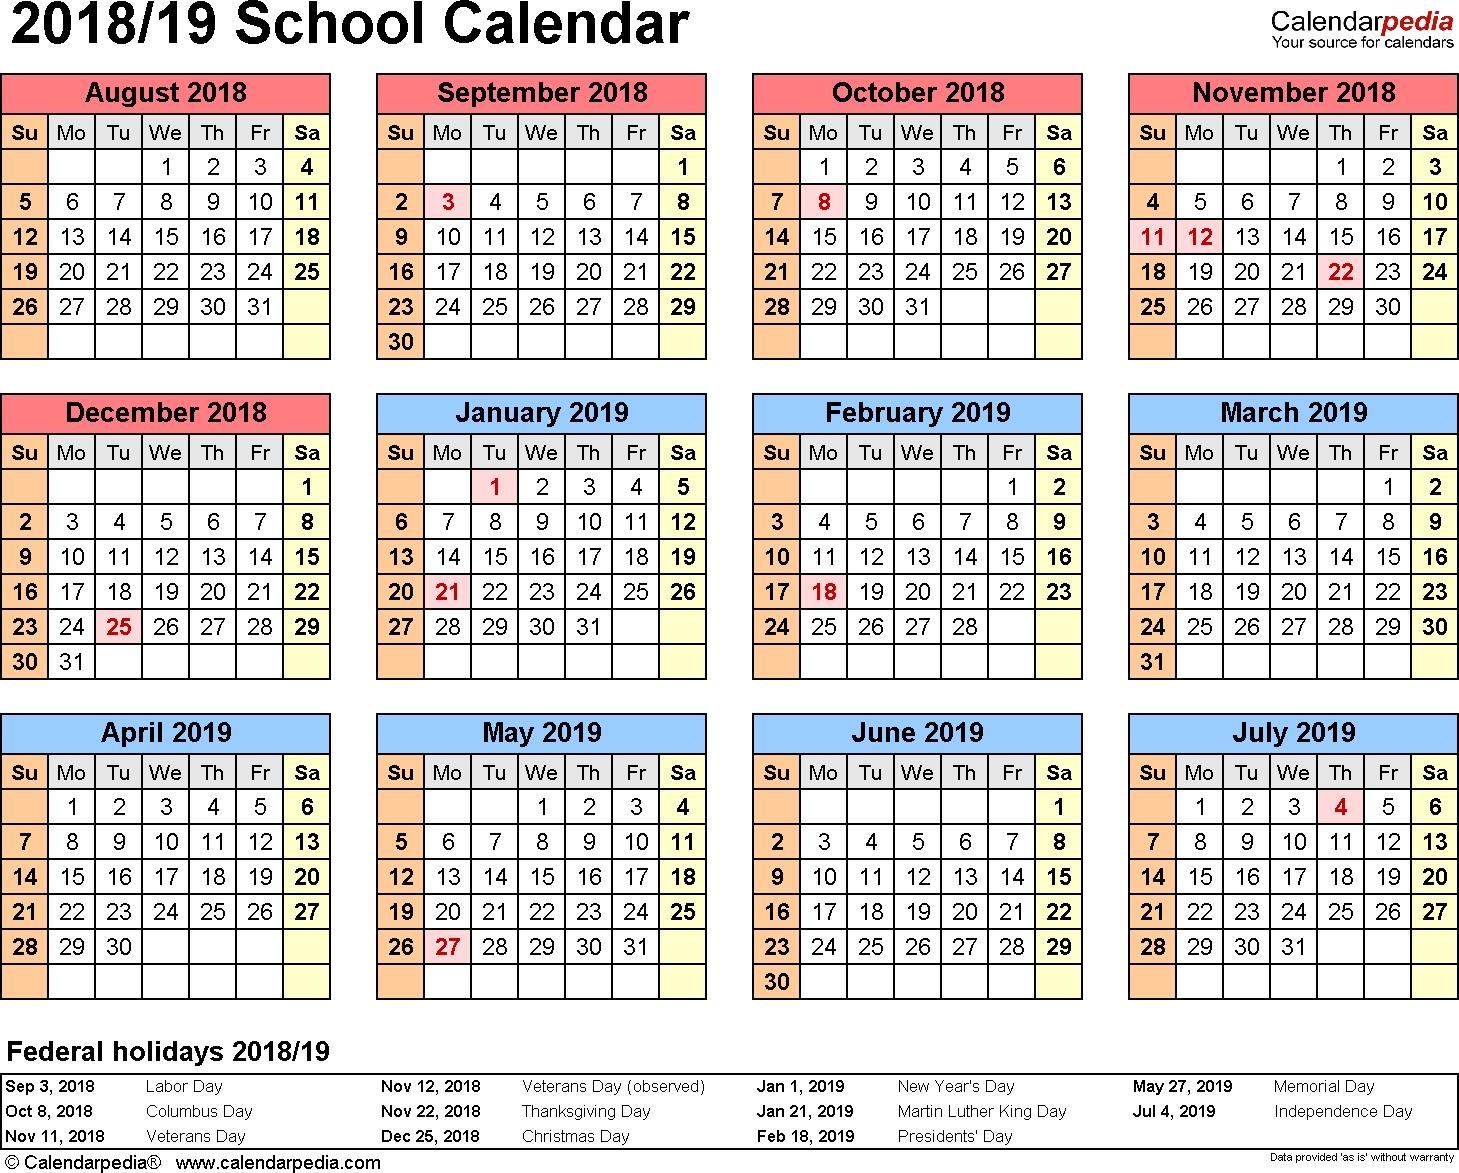 School Calendars 2018/2019 As Free Printable Word Templates_Blank Calendar Template Elementary School